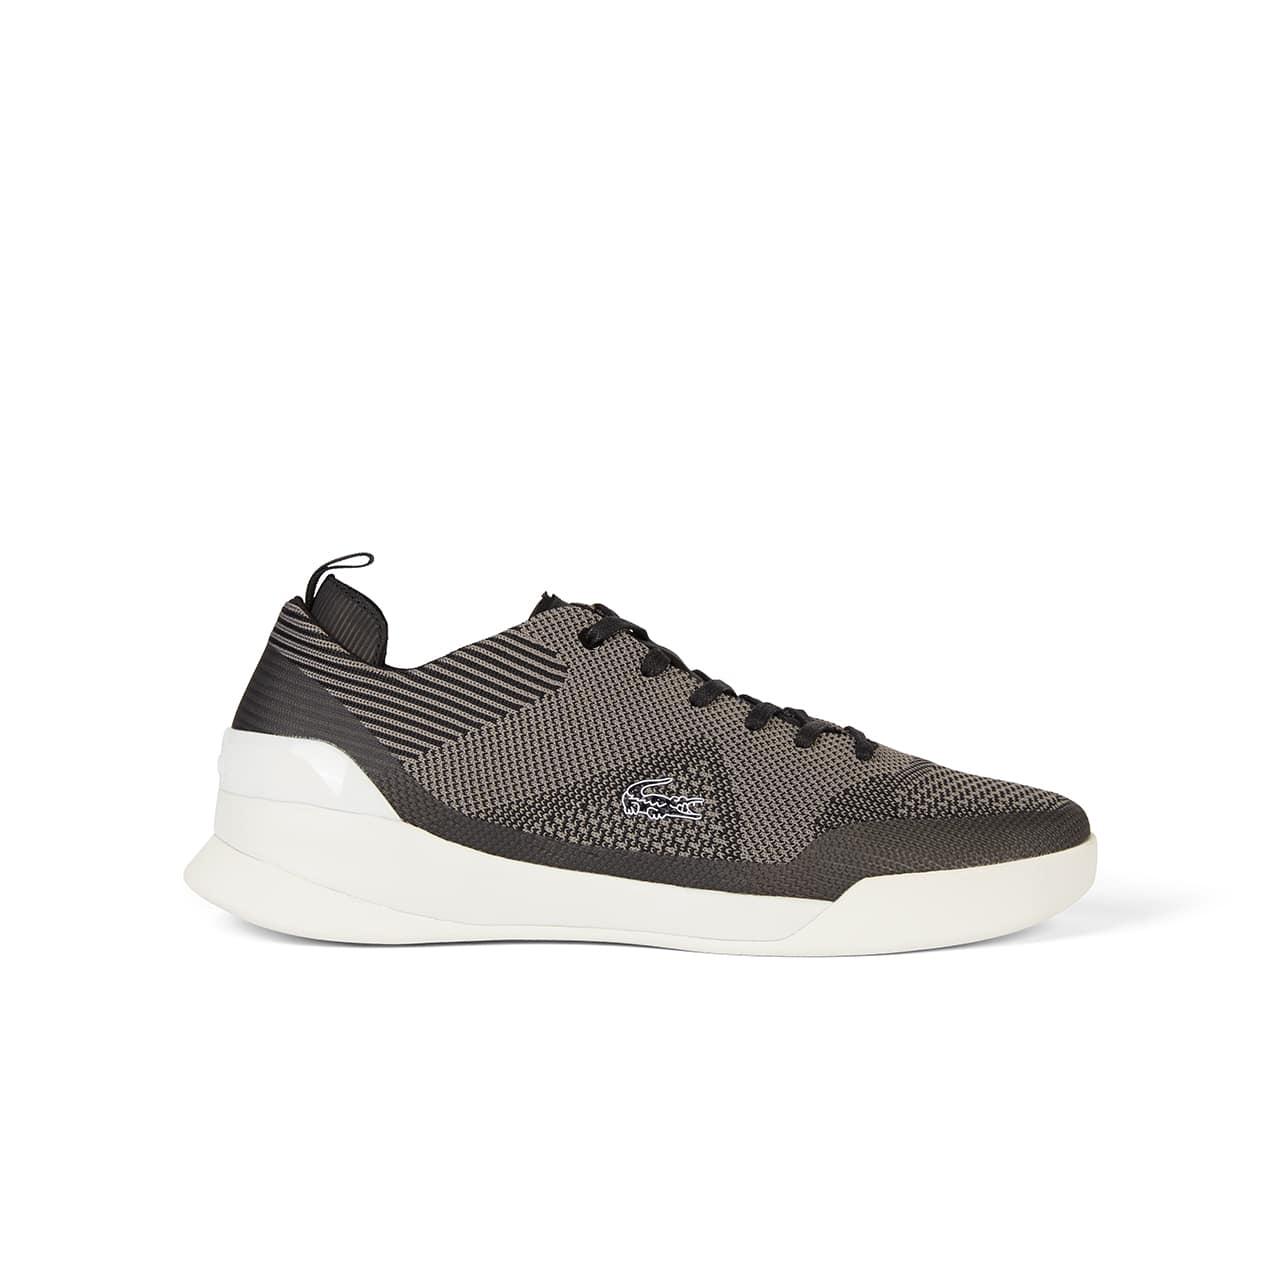 Men's LT Dual Elite Piqué Sneakers